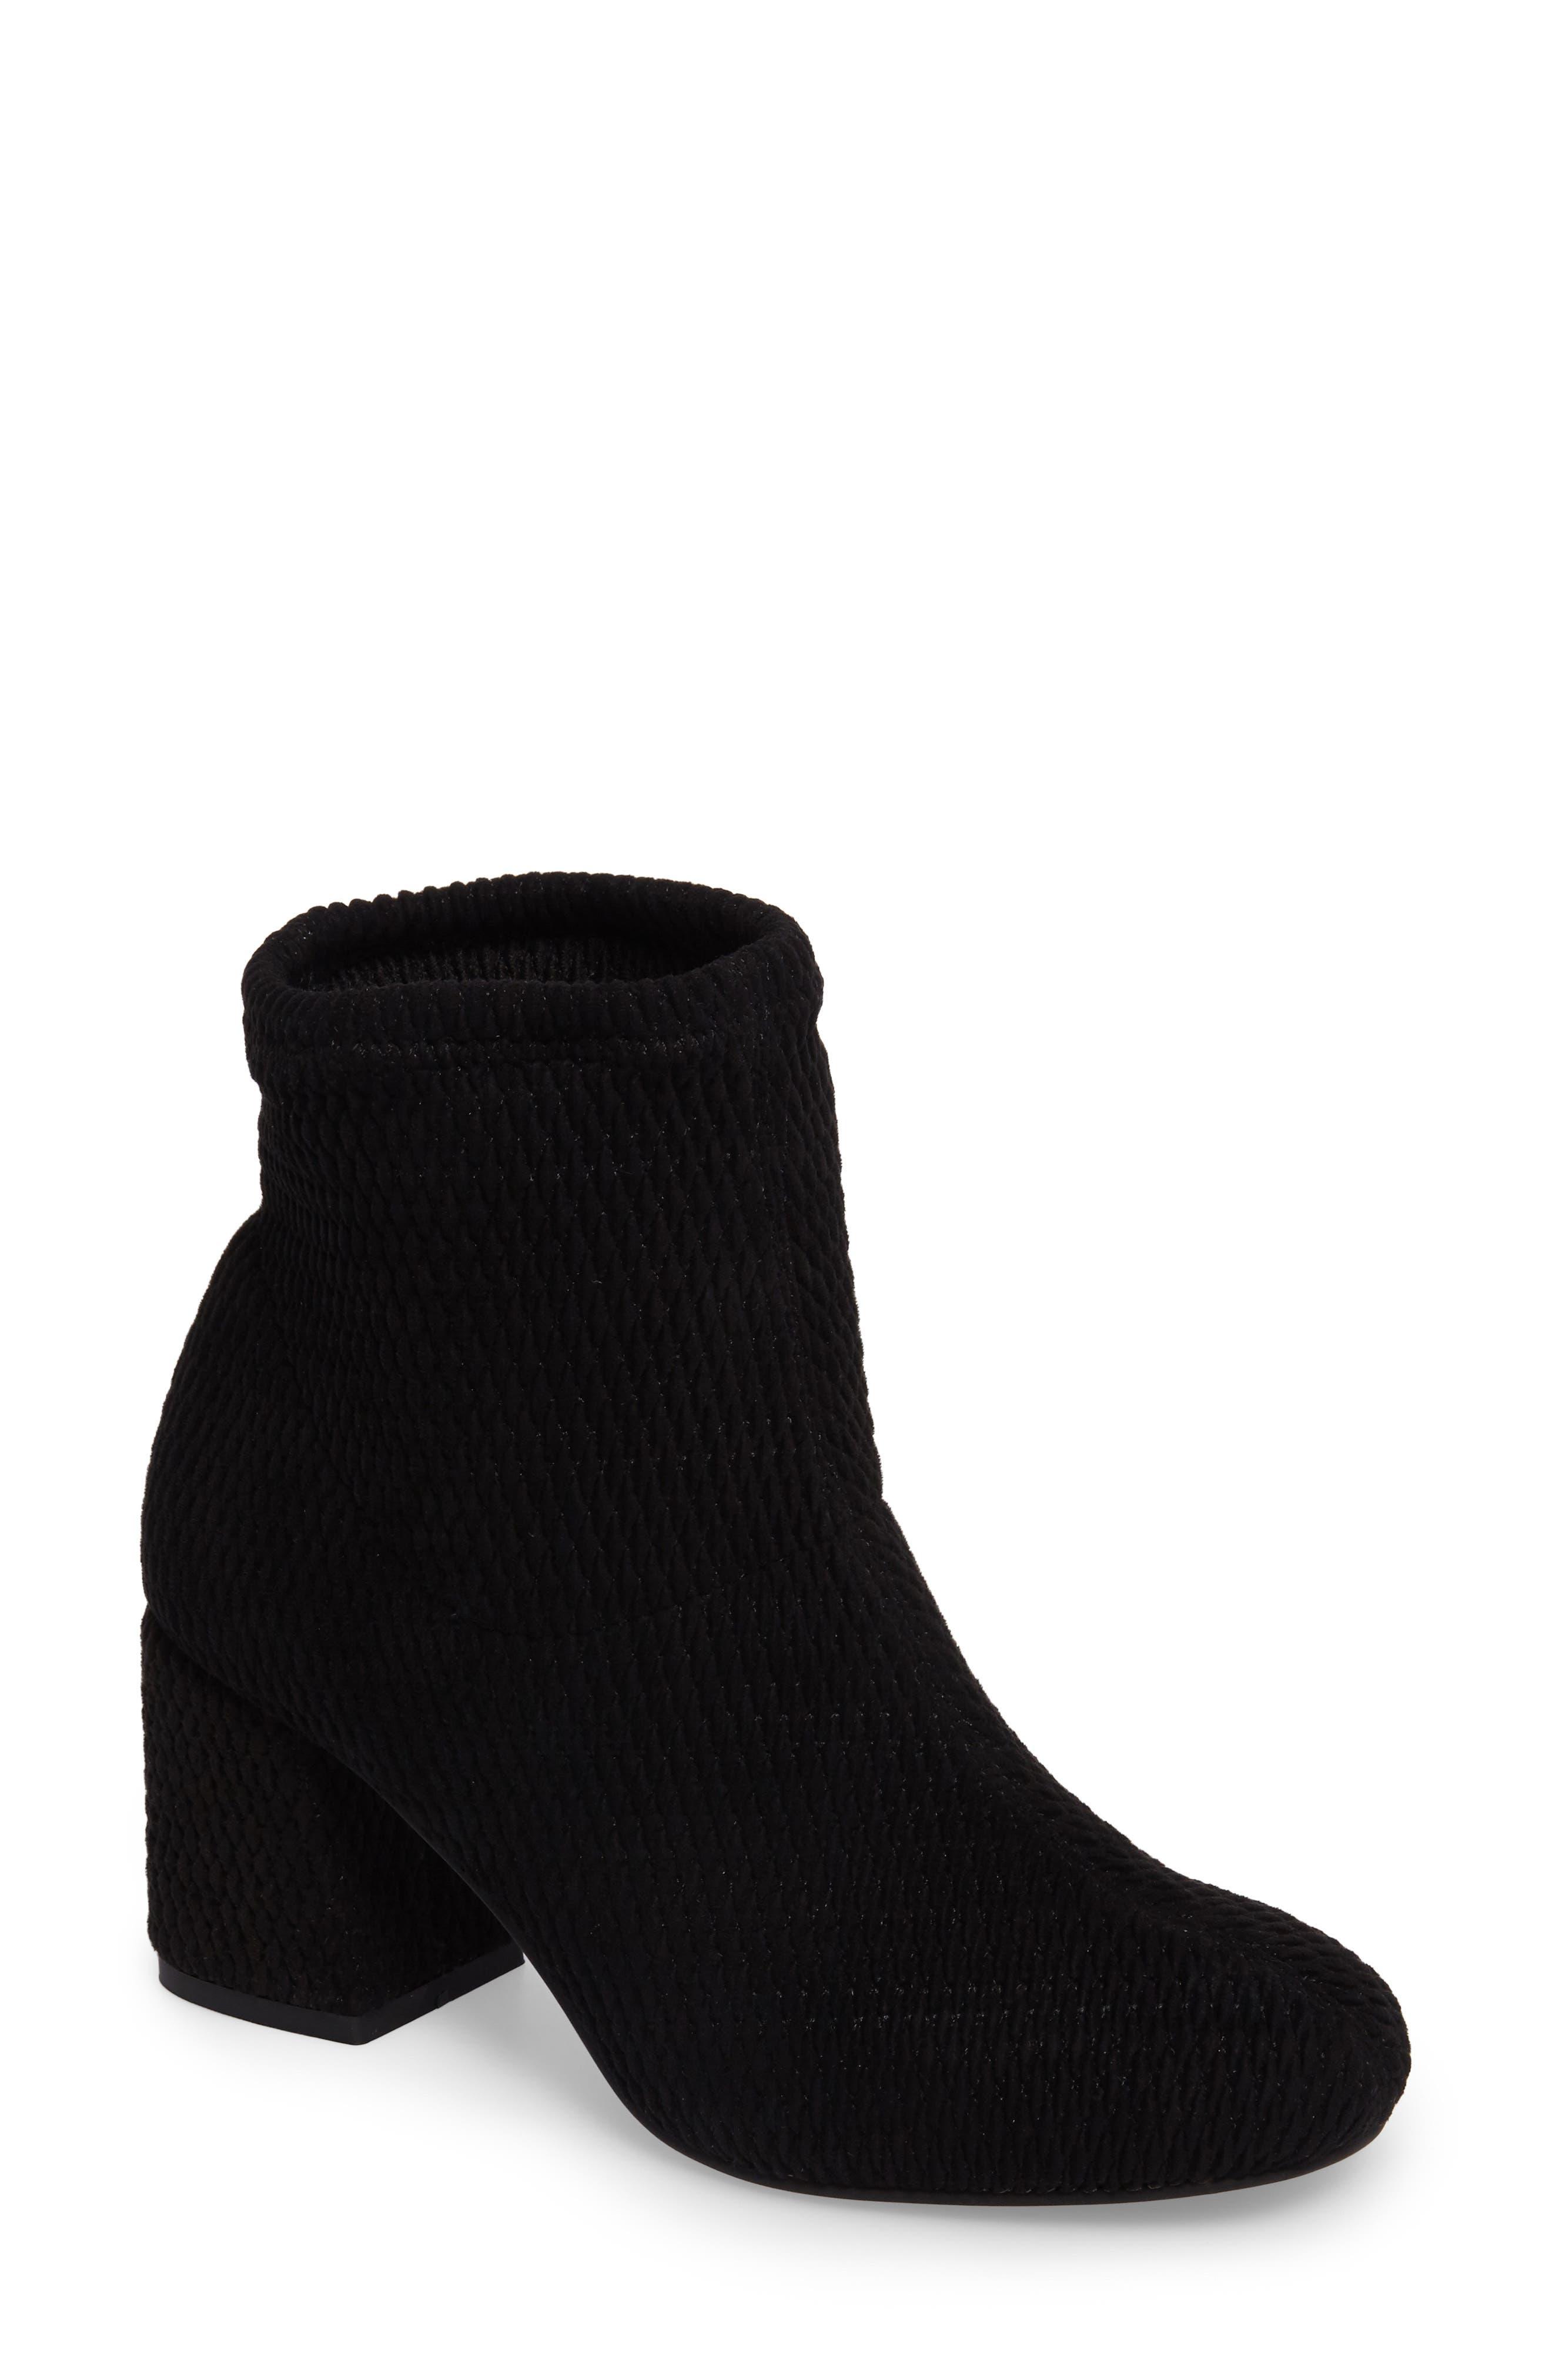 Ad Lib Sock Bootie,                         Main,                         color, 001